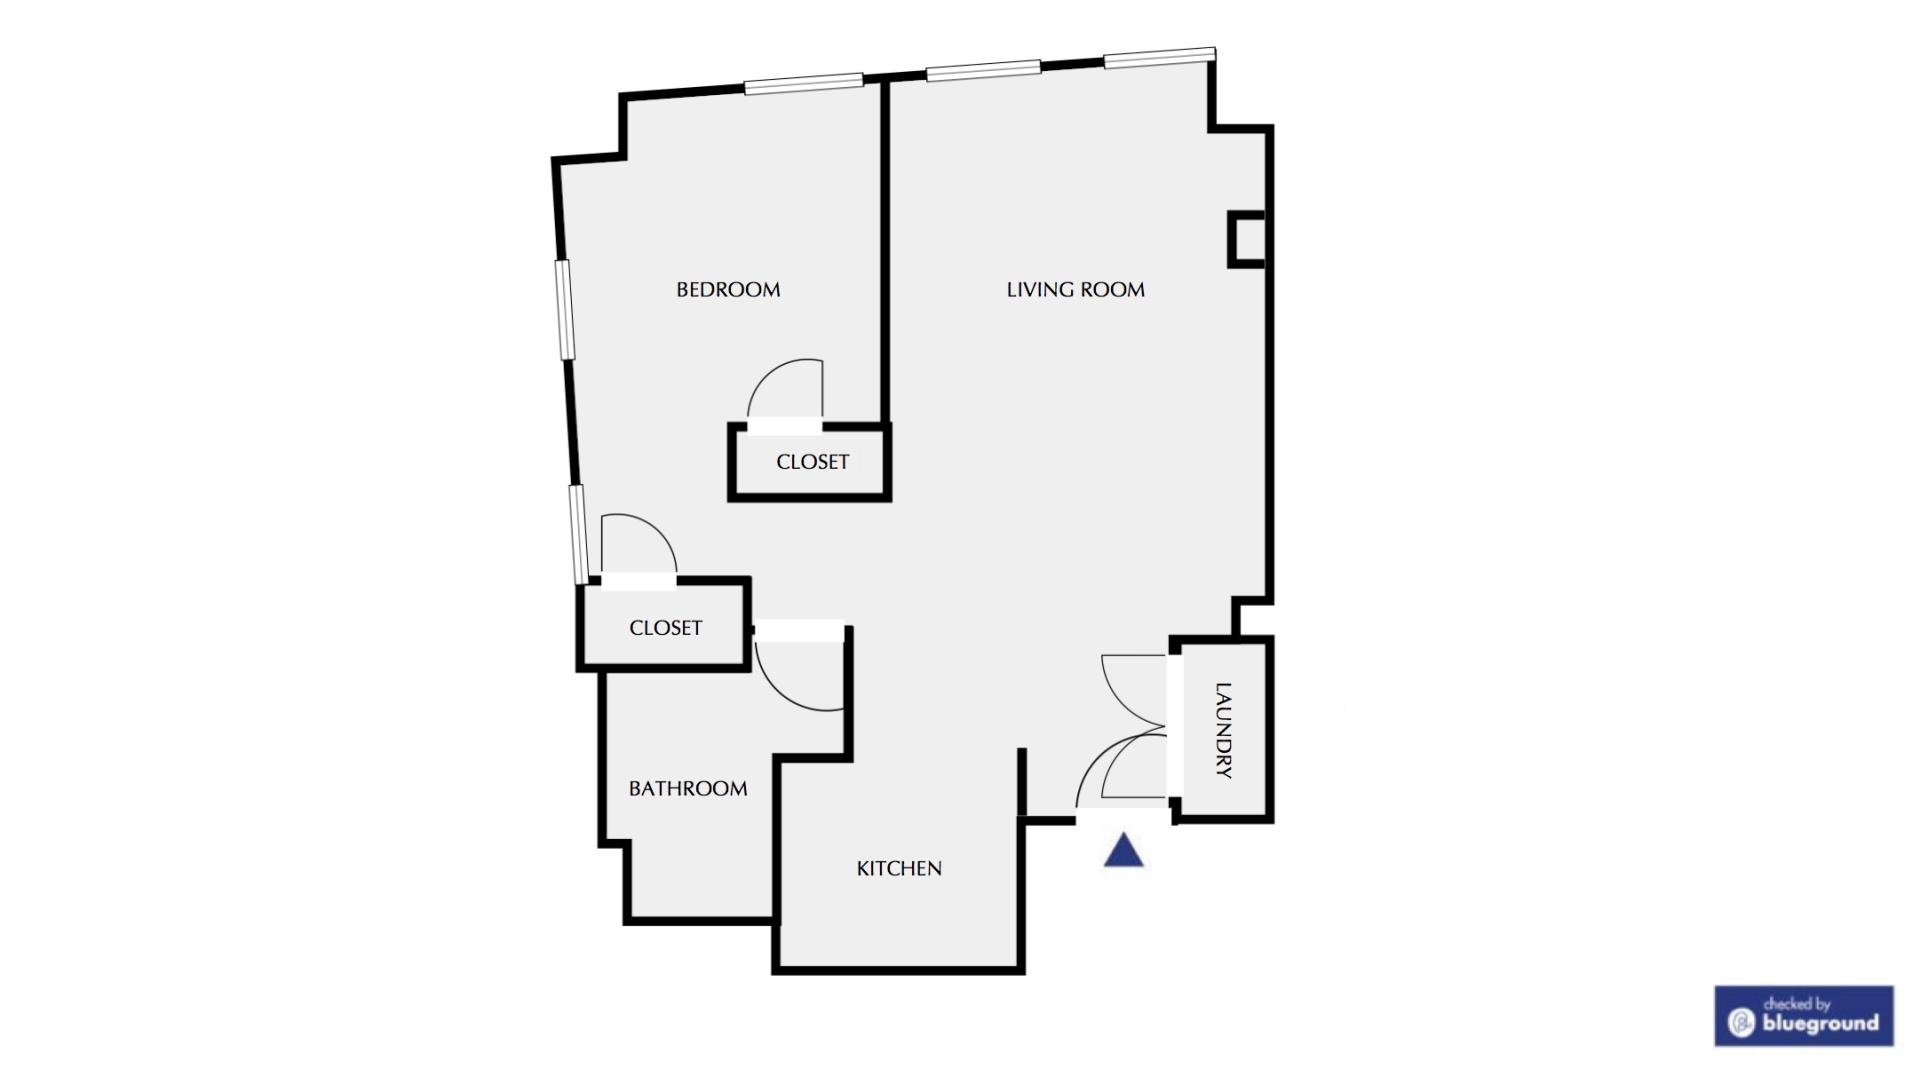 Floor plan of The Lofts on Atlantic Wharf Apartment